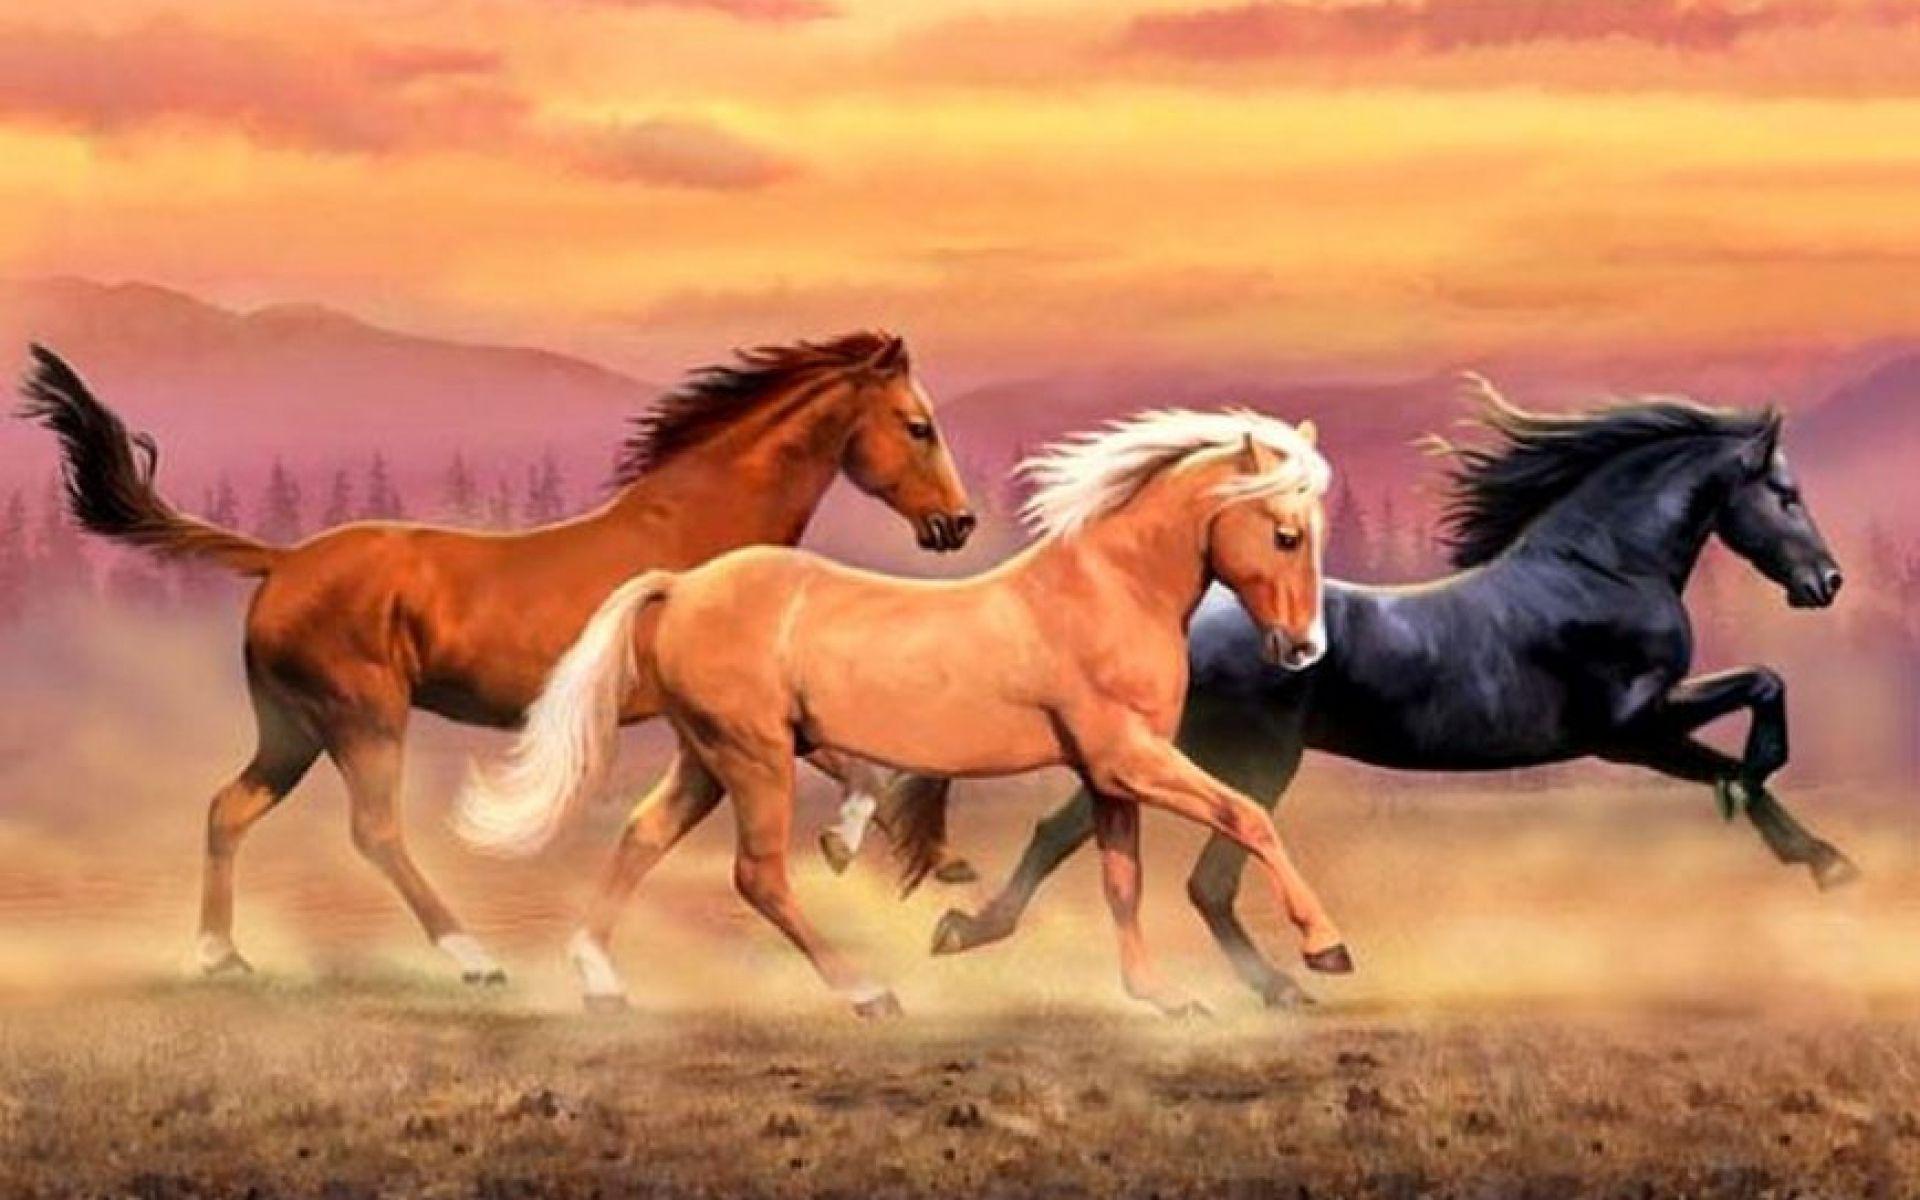 Popular Wallpaper Horse Family - c39e28c37f5823aeb35d018df00e020a  Pictures_12956.jpg